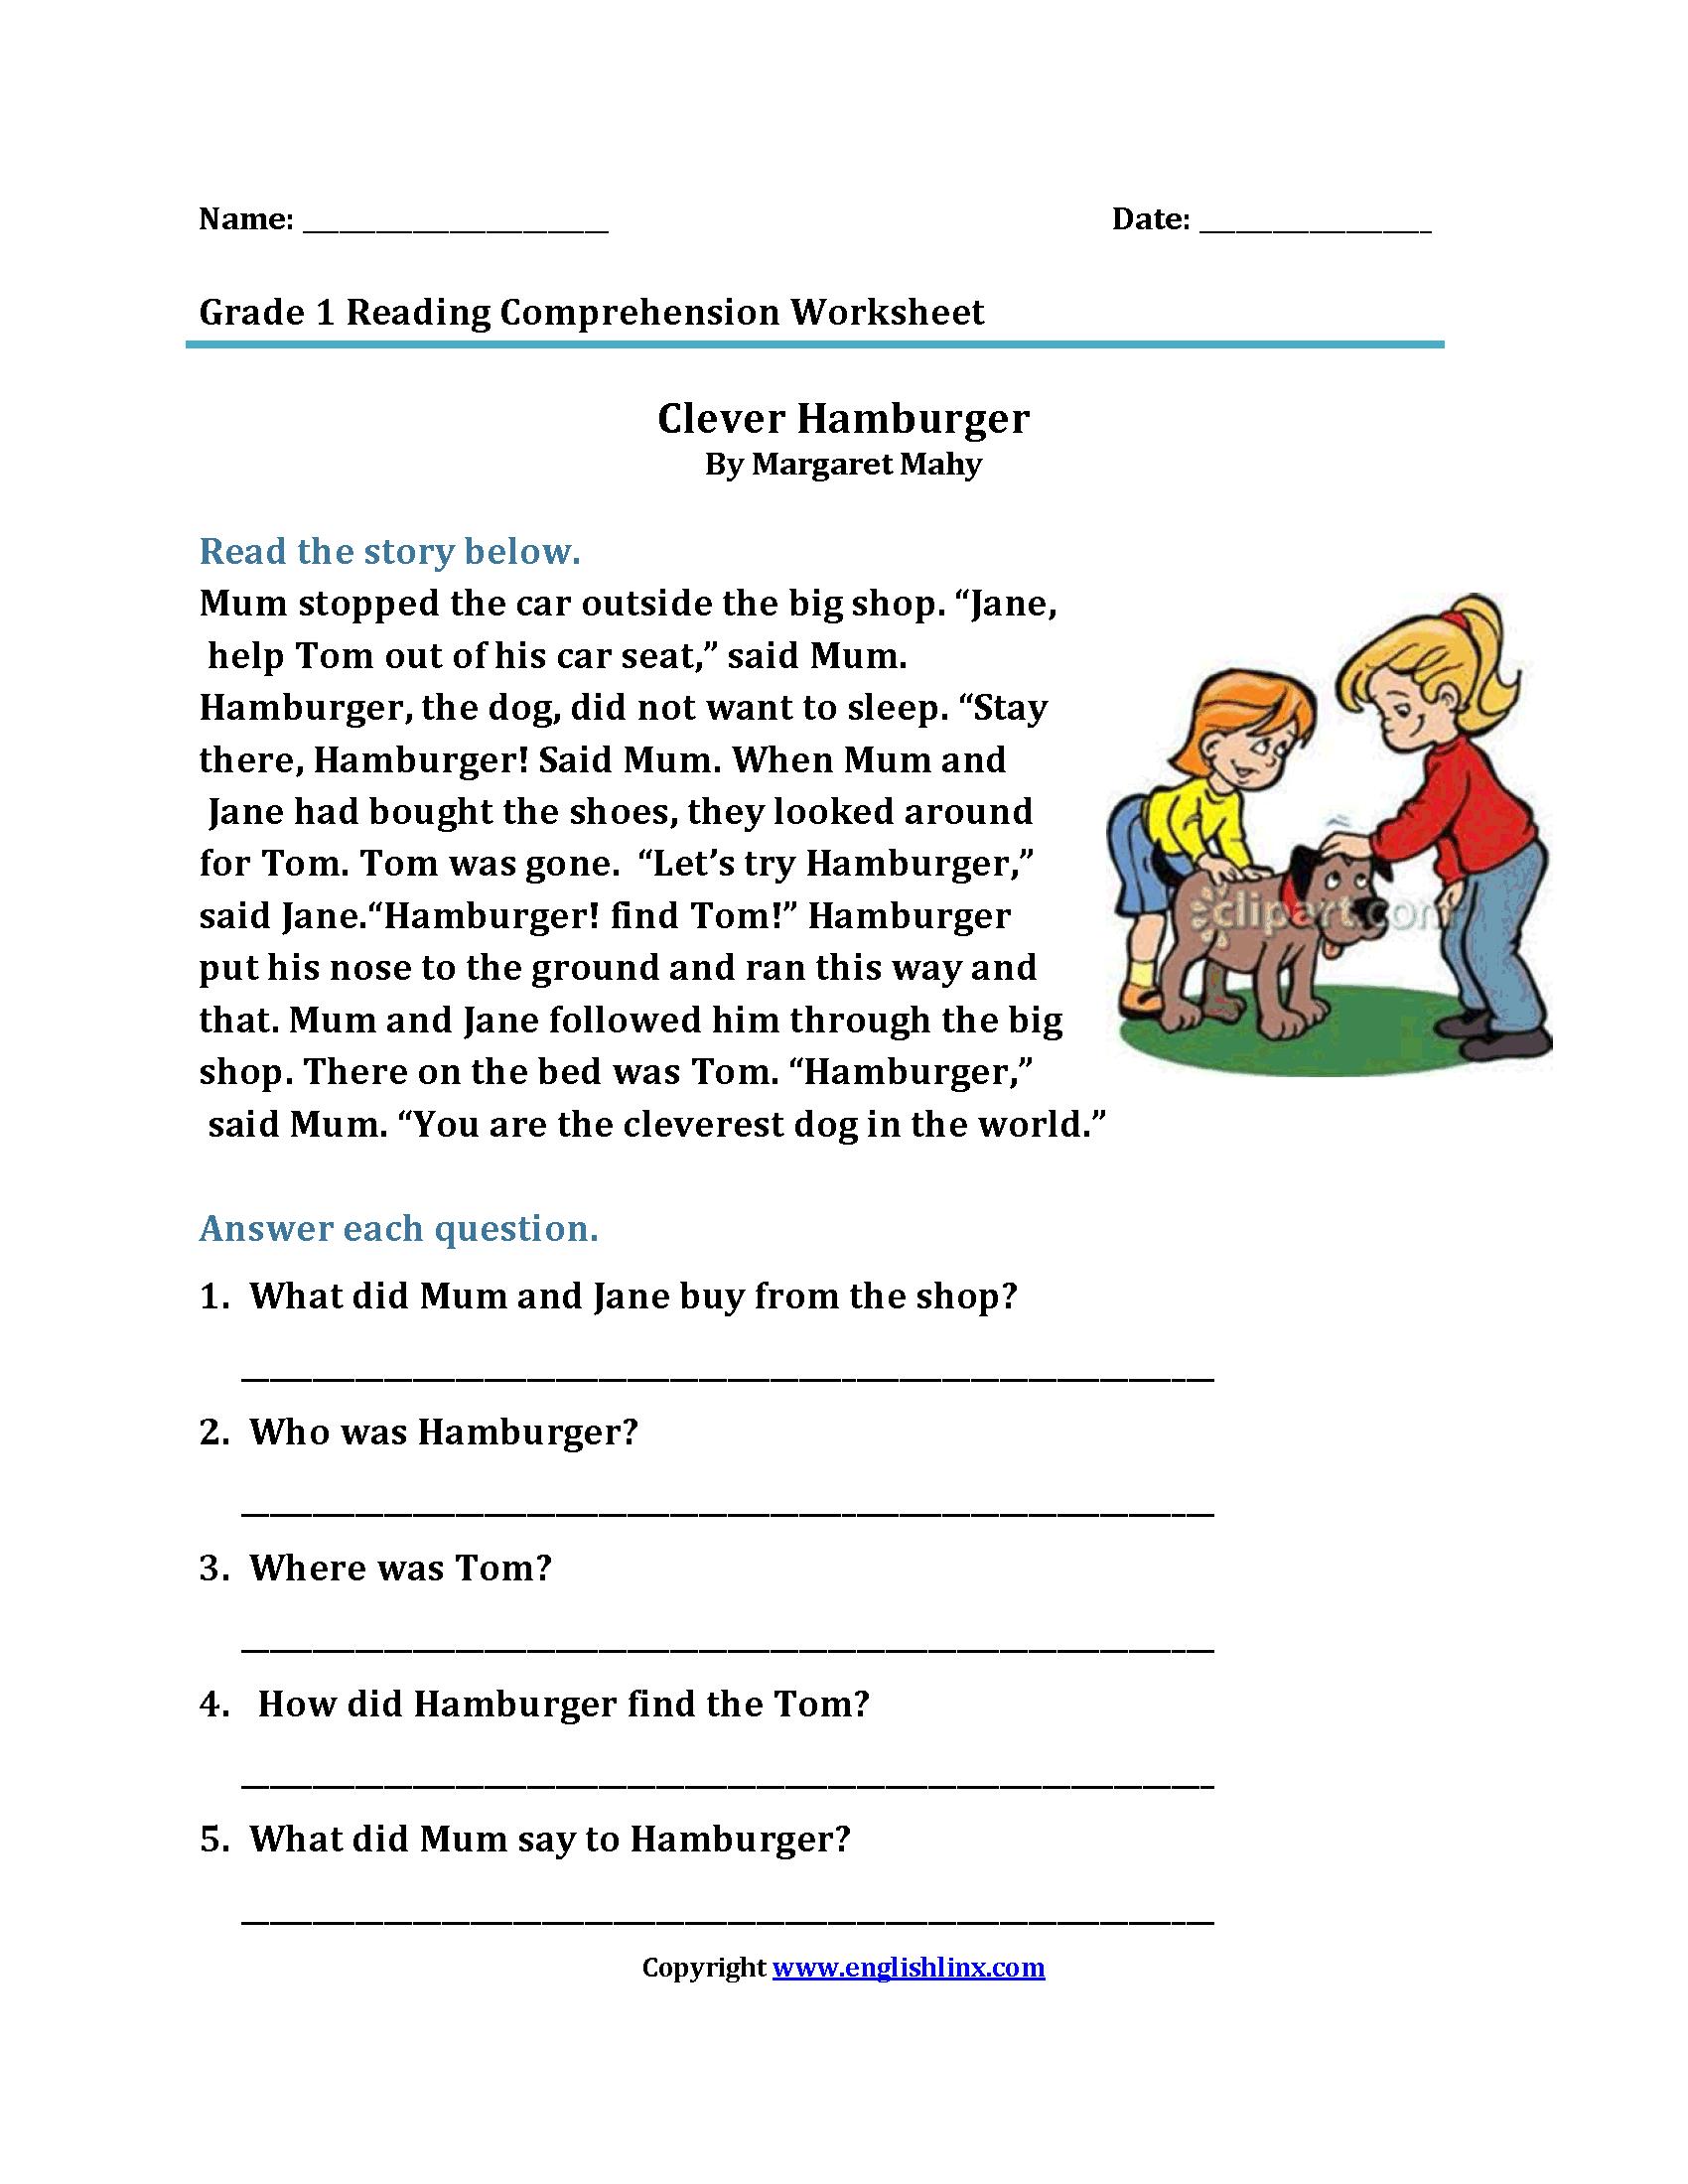 Clever Hamburger First Grade Reading Worksheets